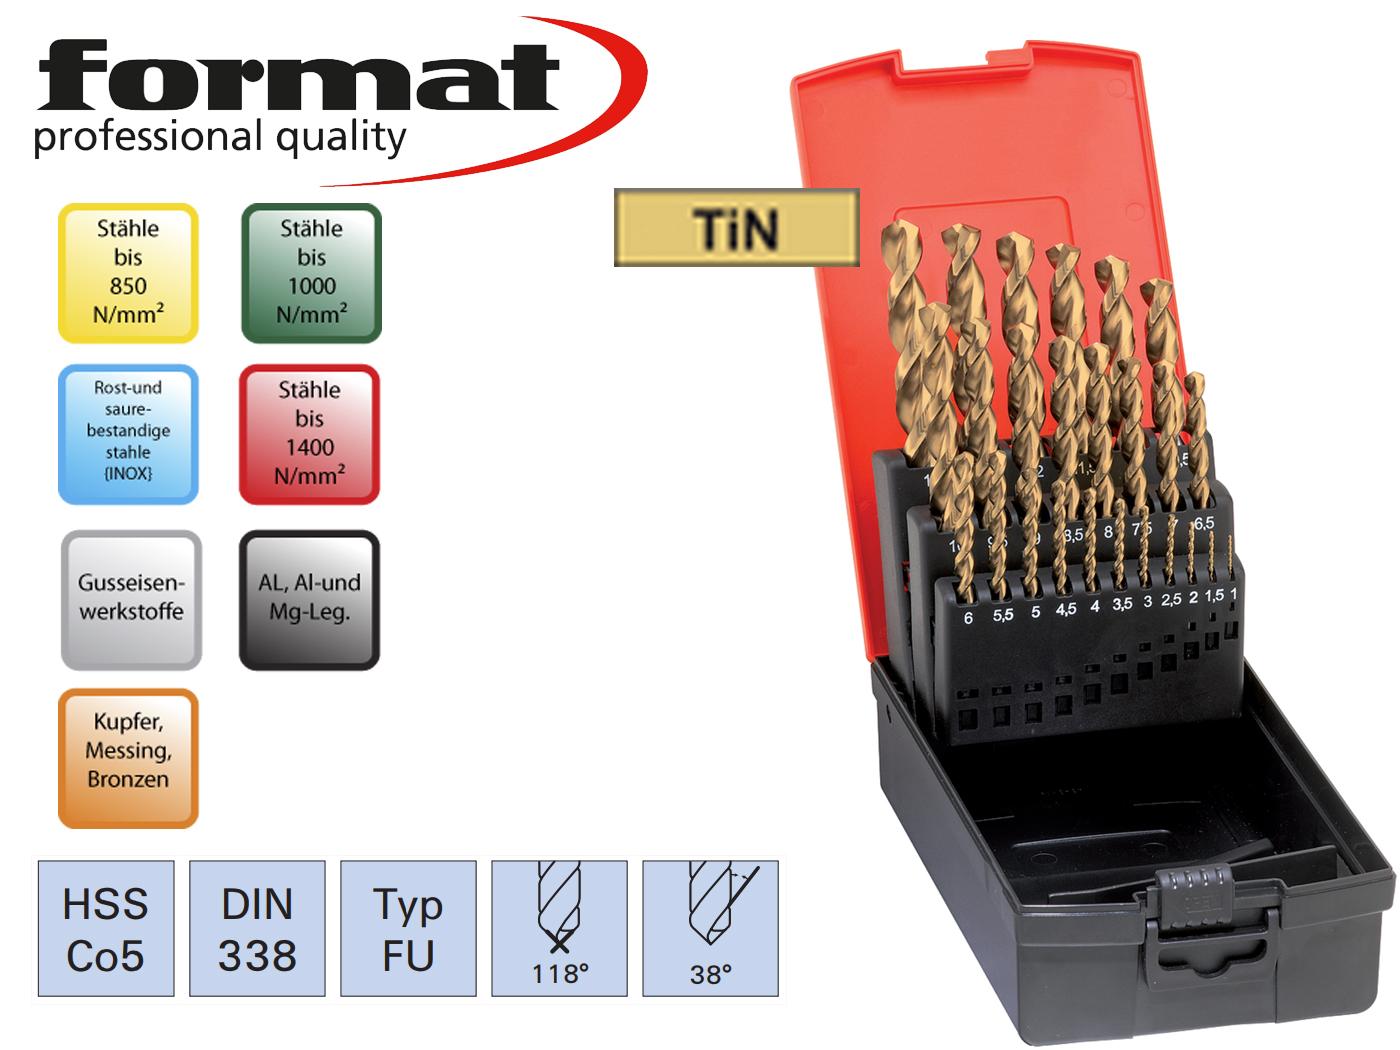 Spiraalborenset DIN 338 HSSECo5 FU FORMAT | DKMTools - DKM Tools